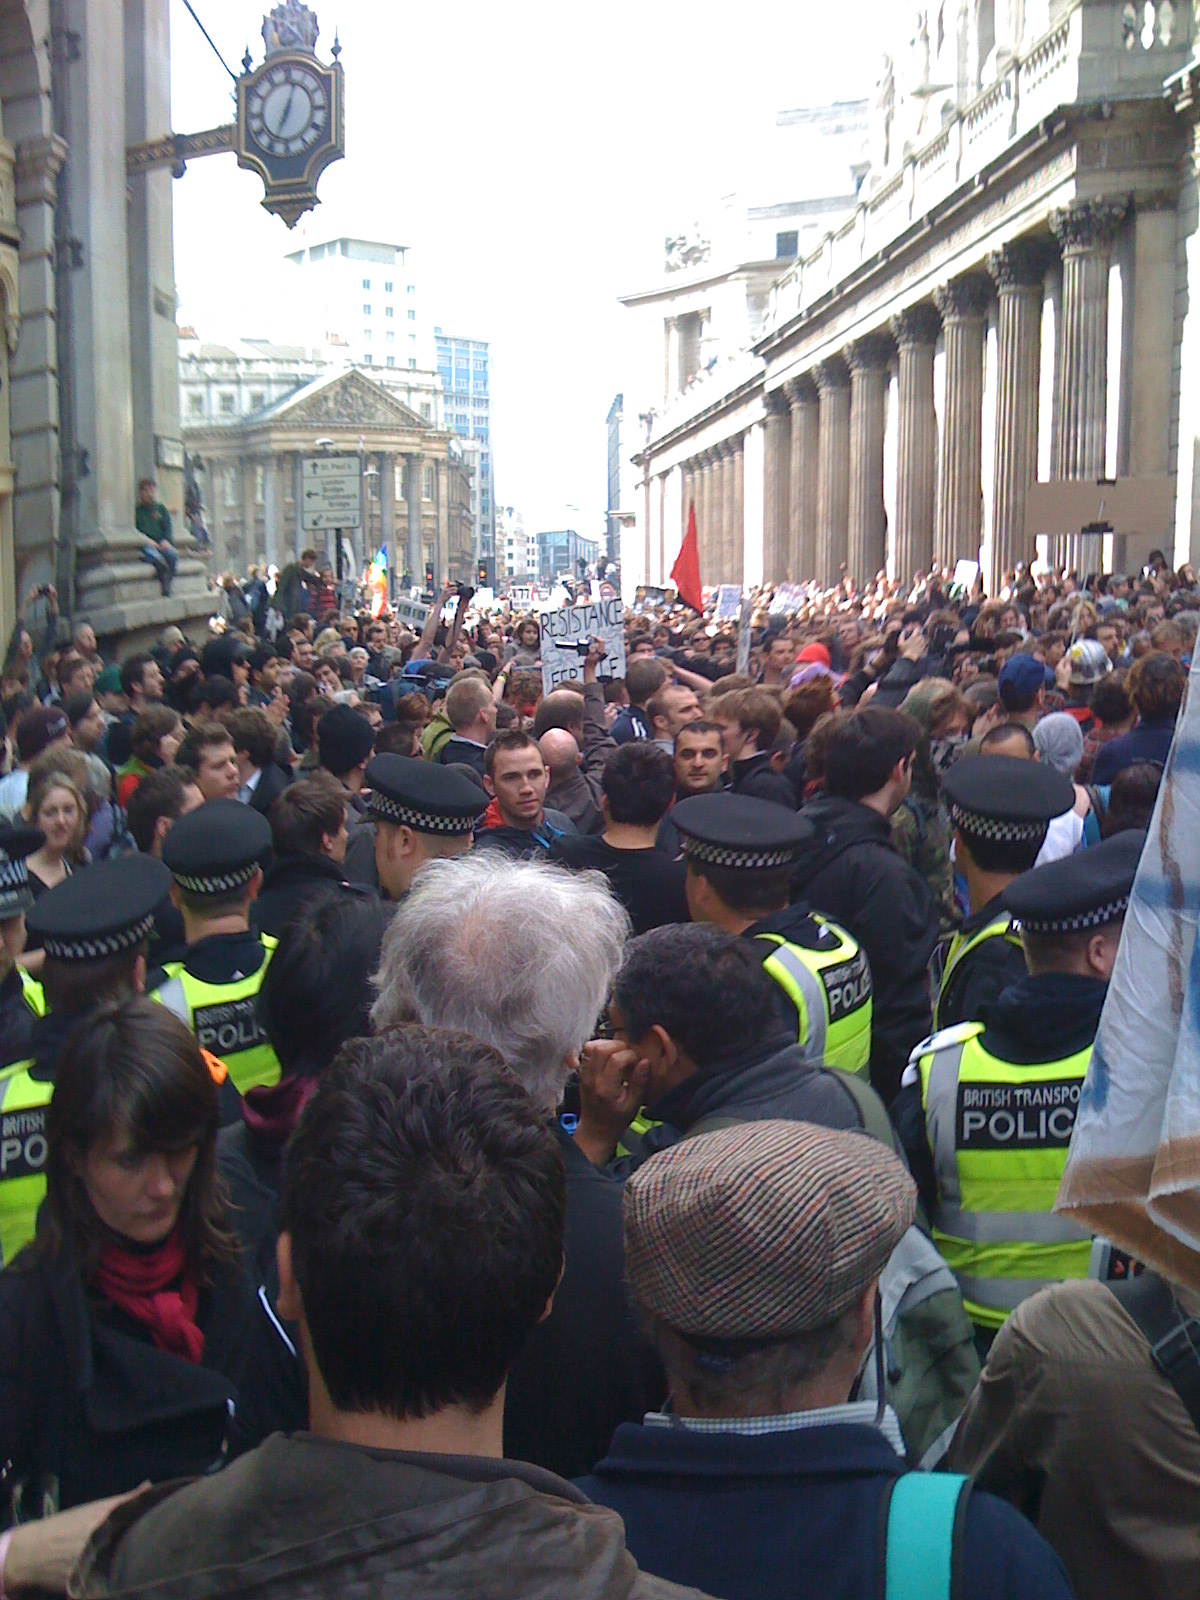 Menschenmenge - Quelle: Wikimedia